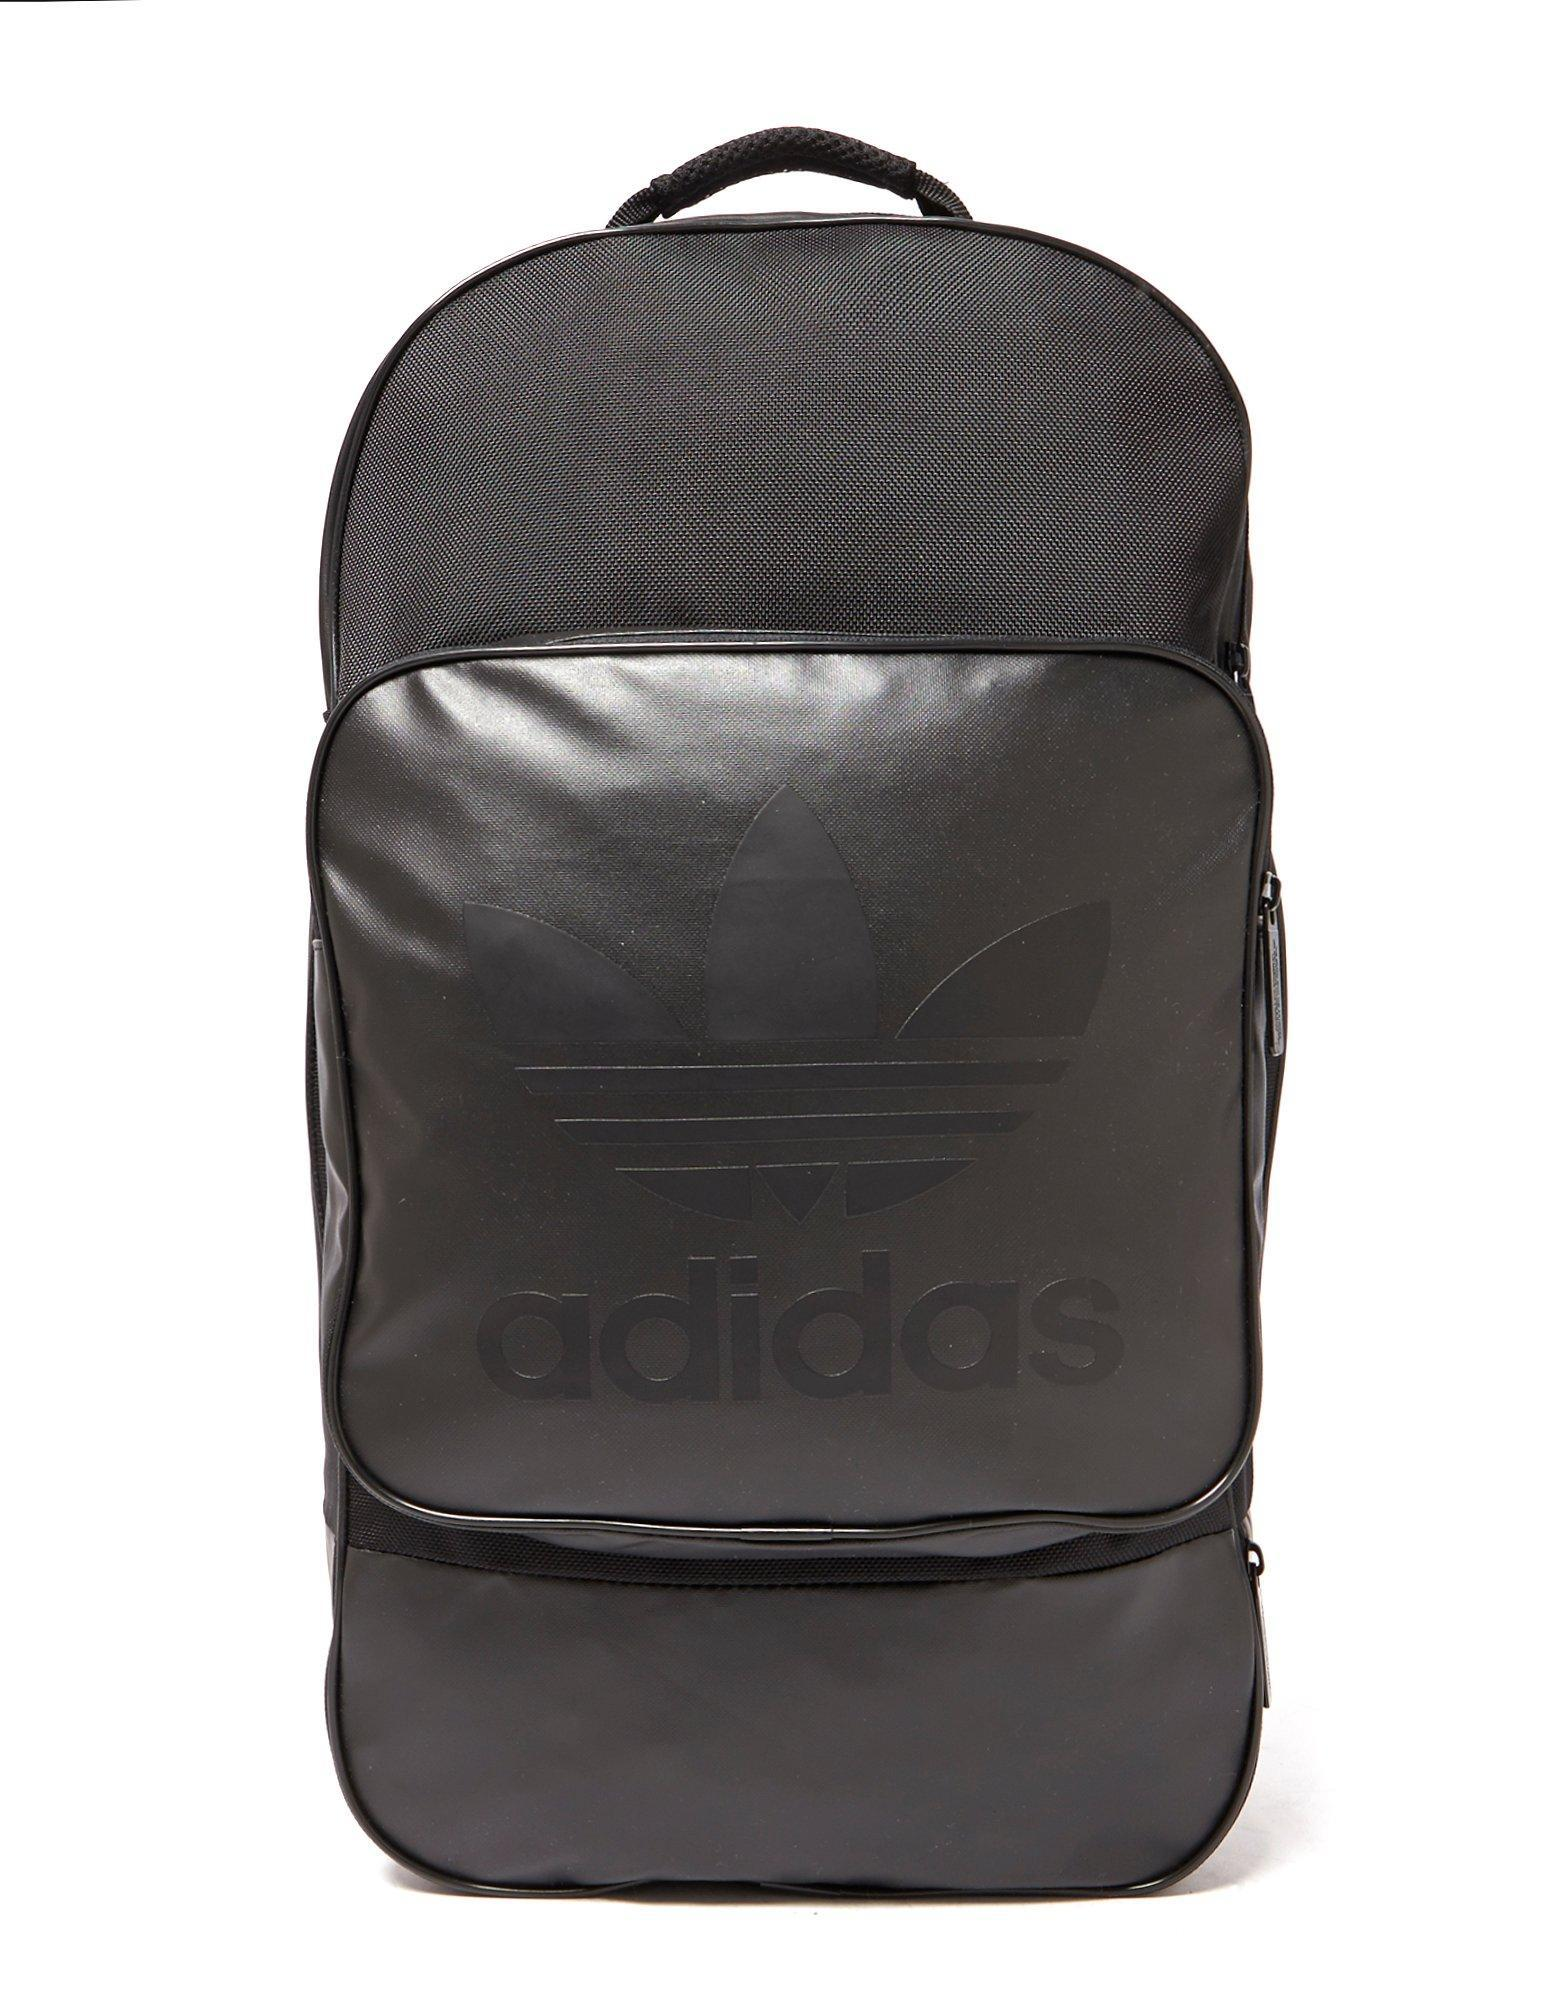 adidas Originals Street Sport Backpack in Black for Men - Lyst 19f1b608dc375